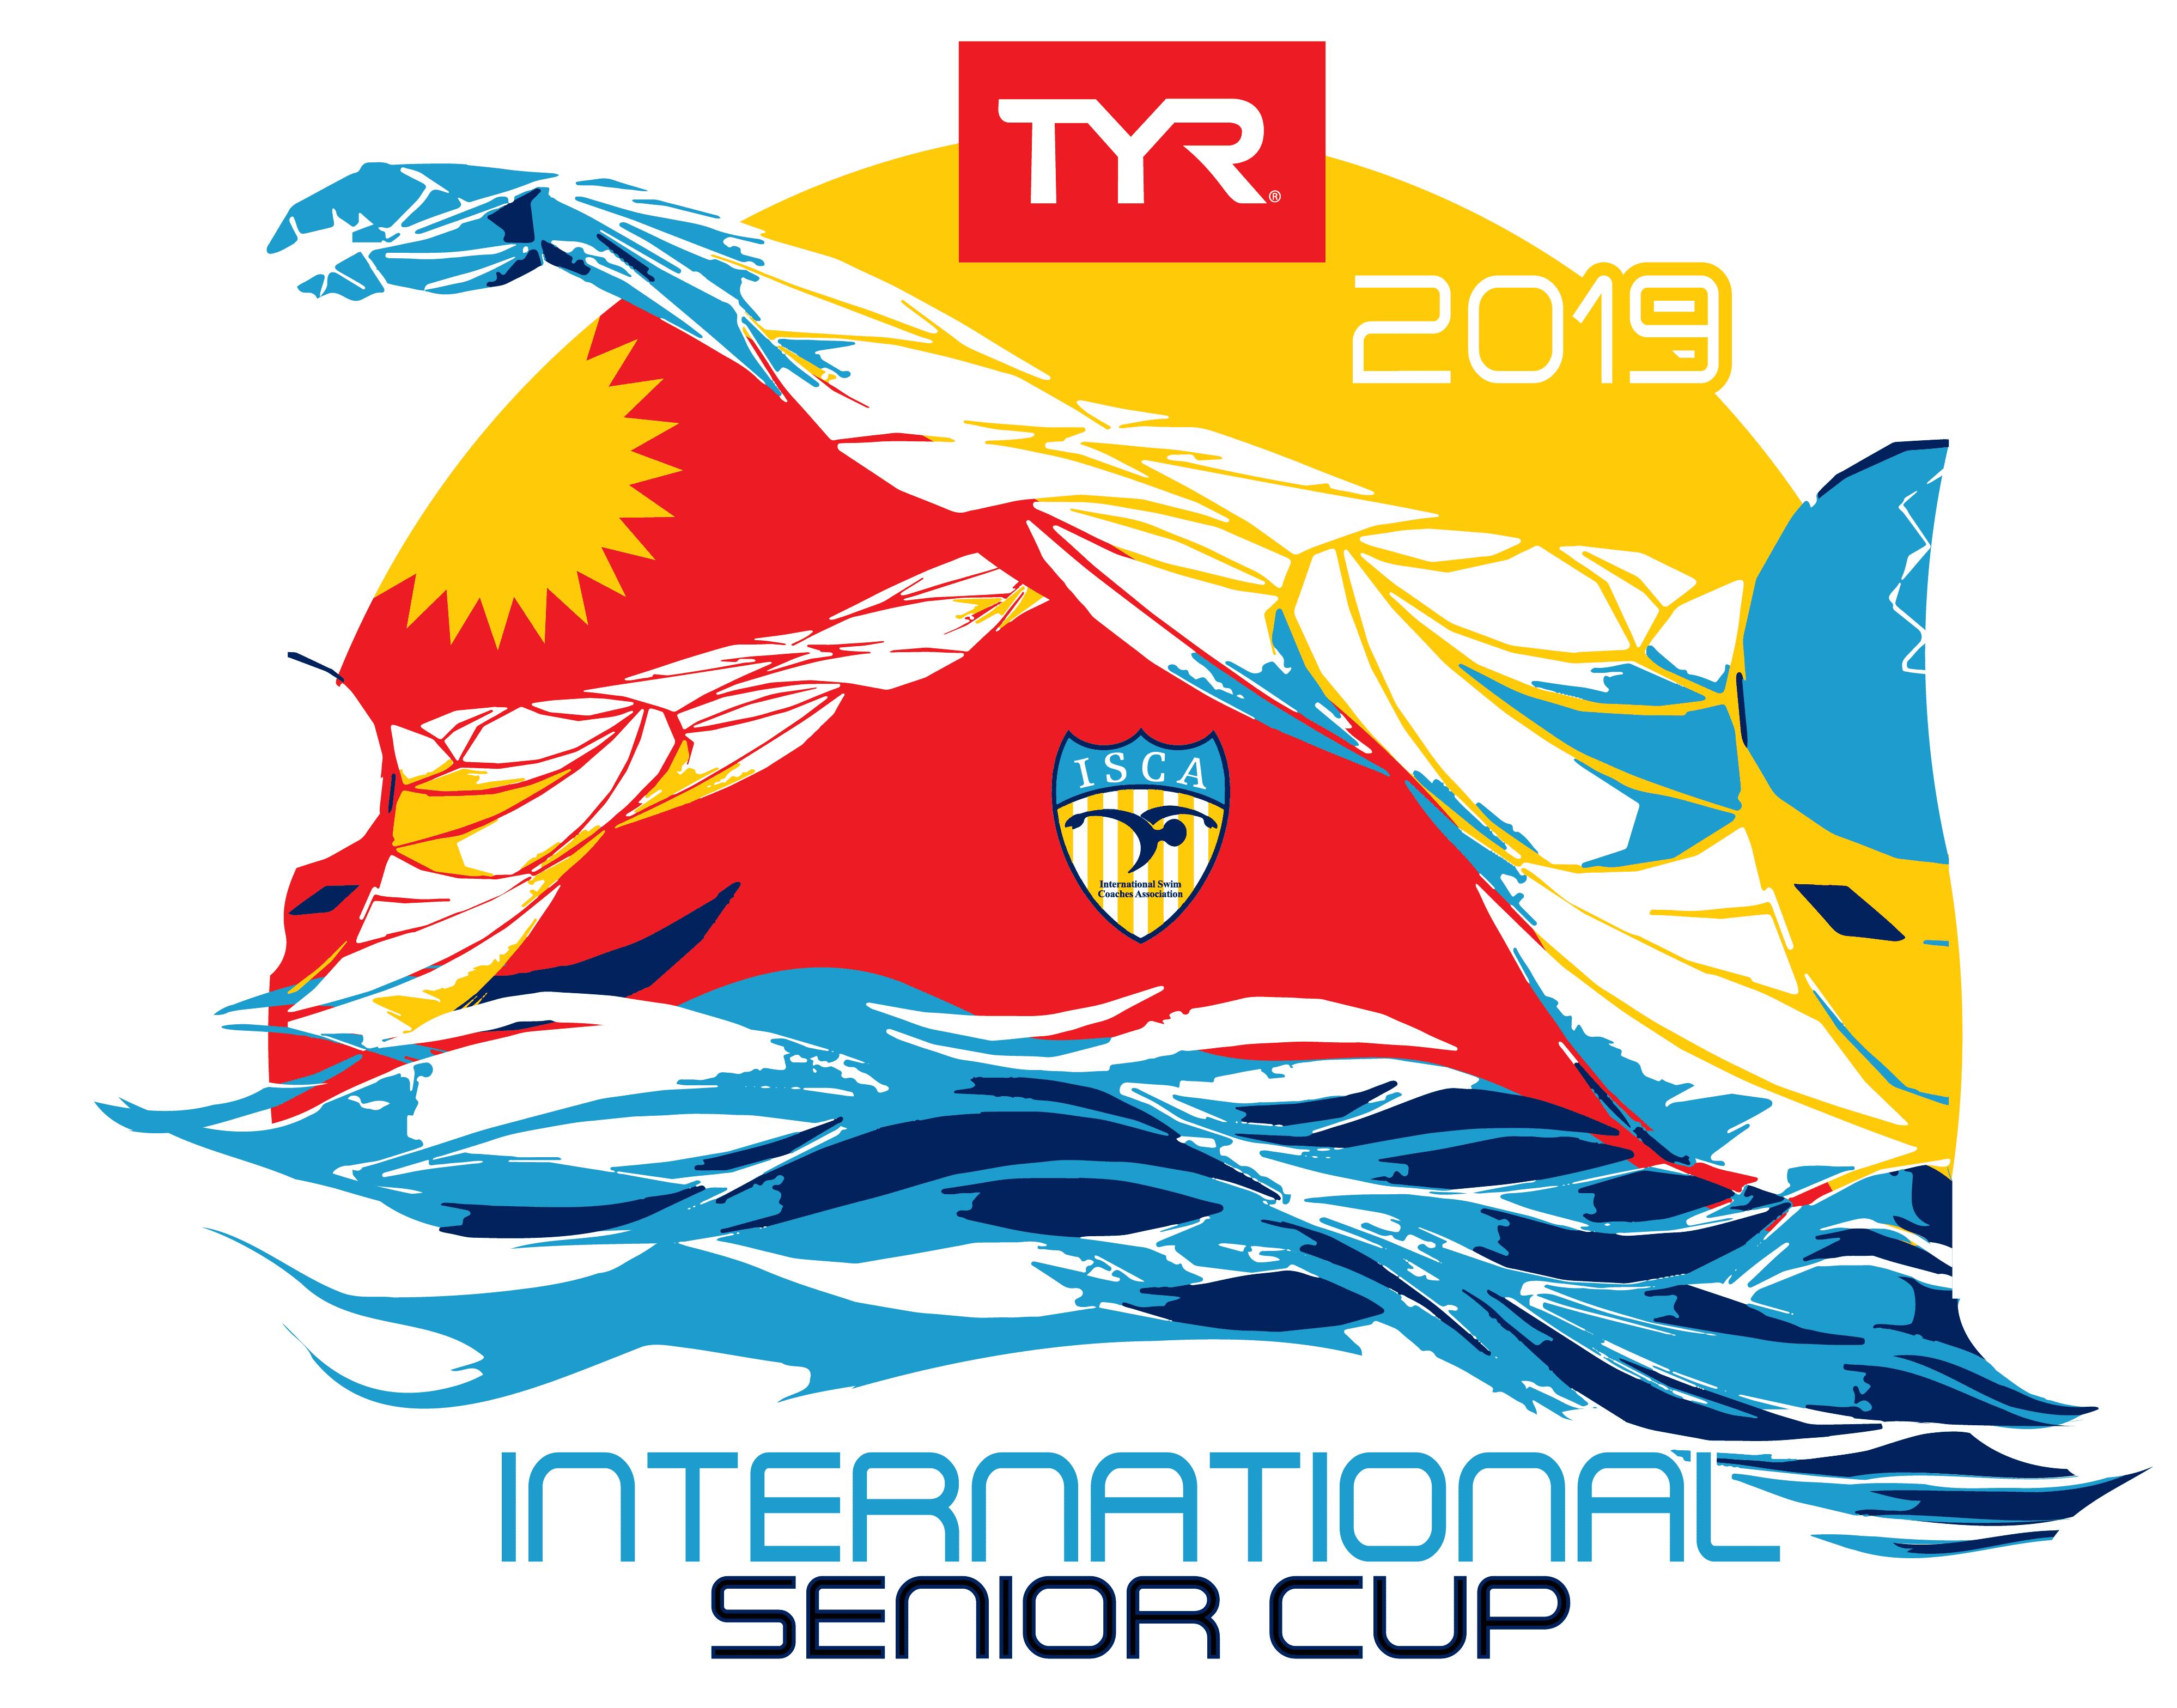 International senior cup